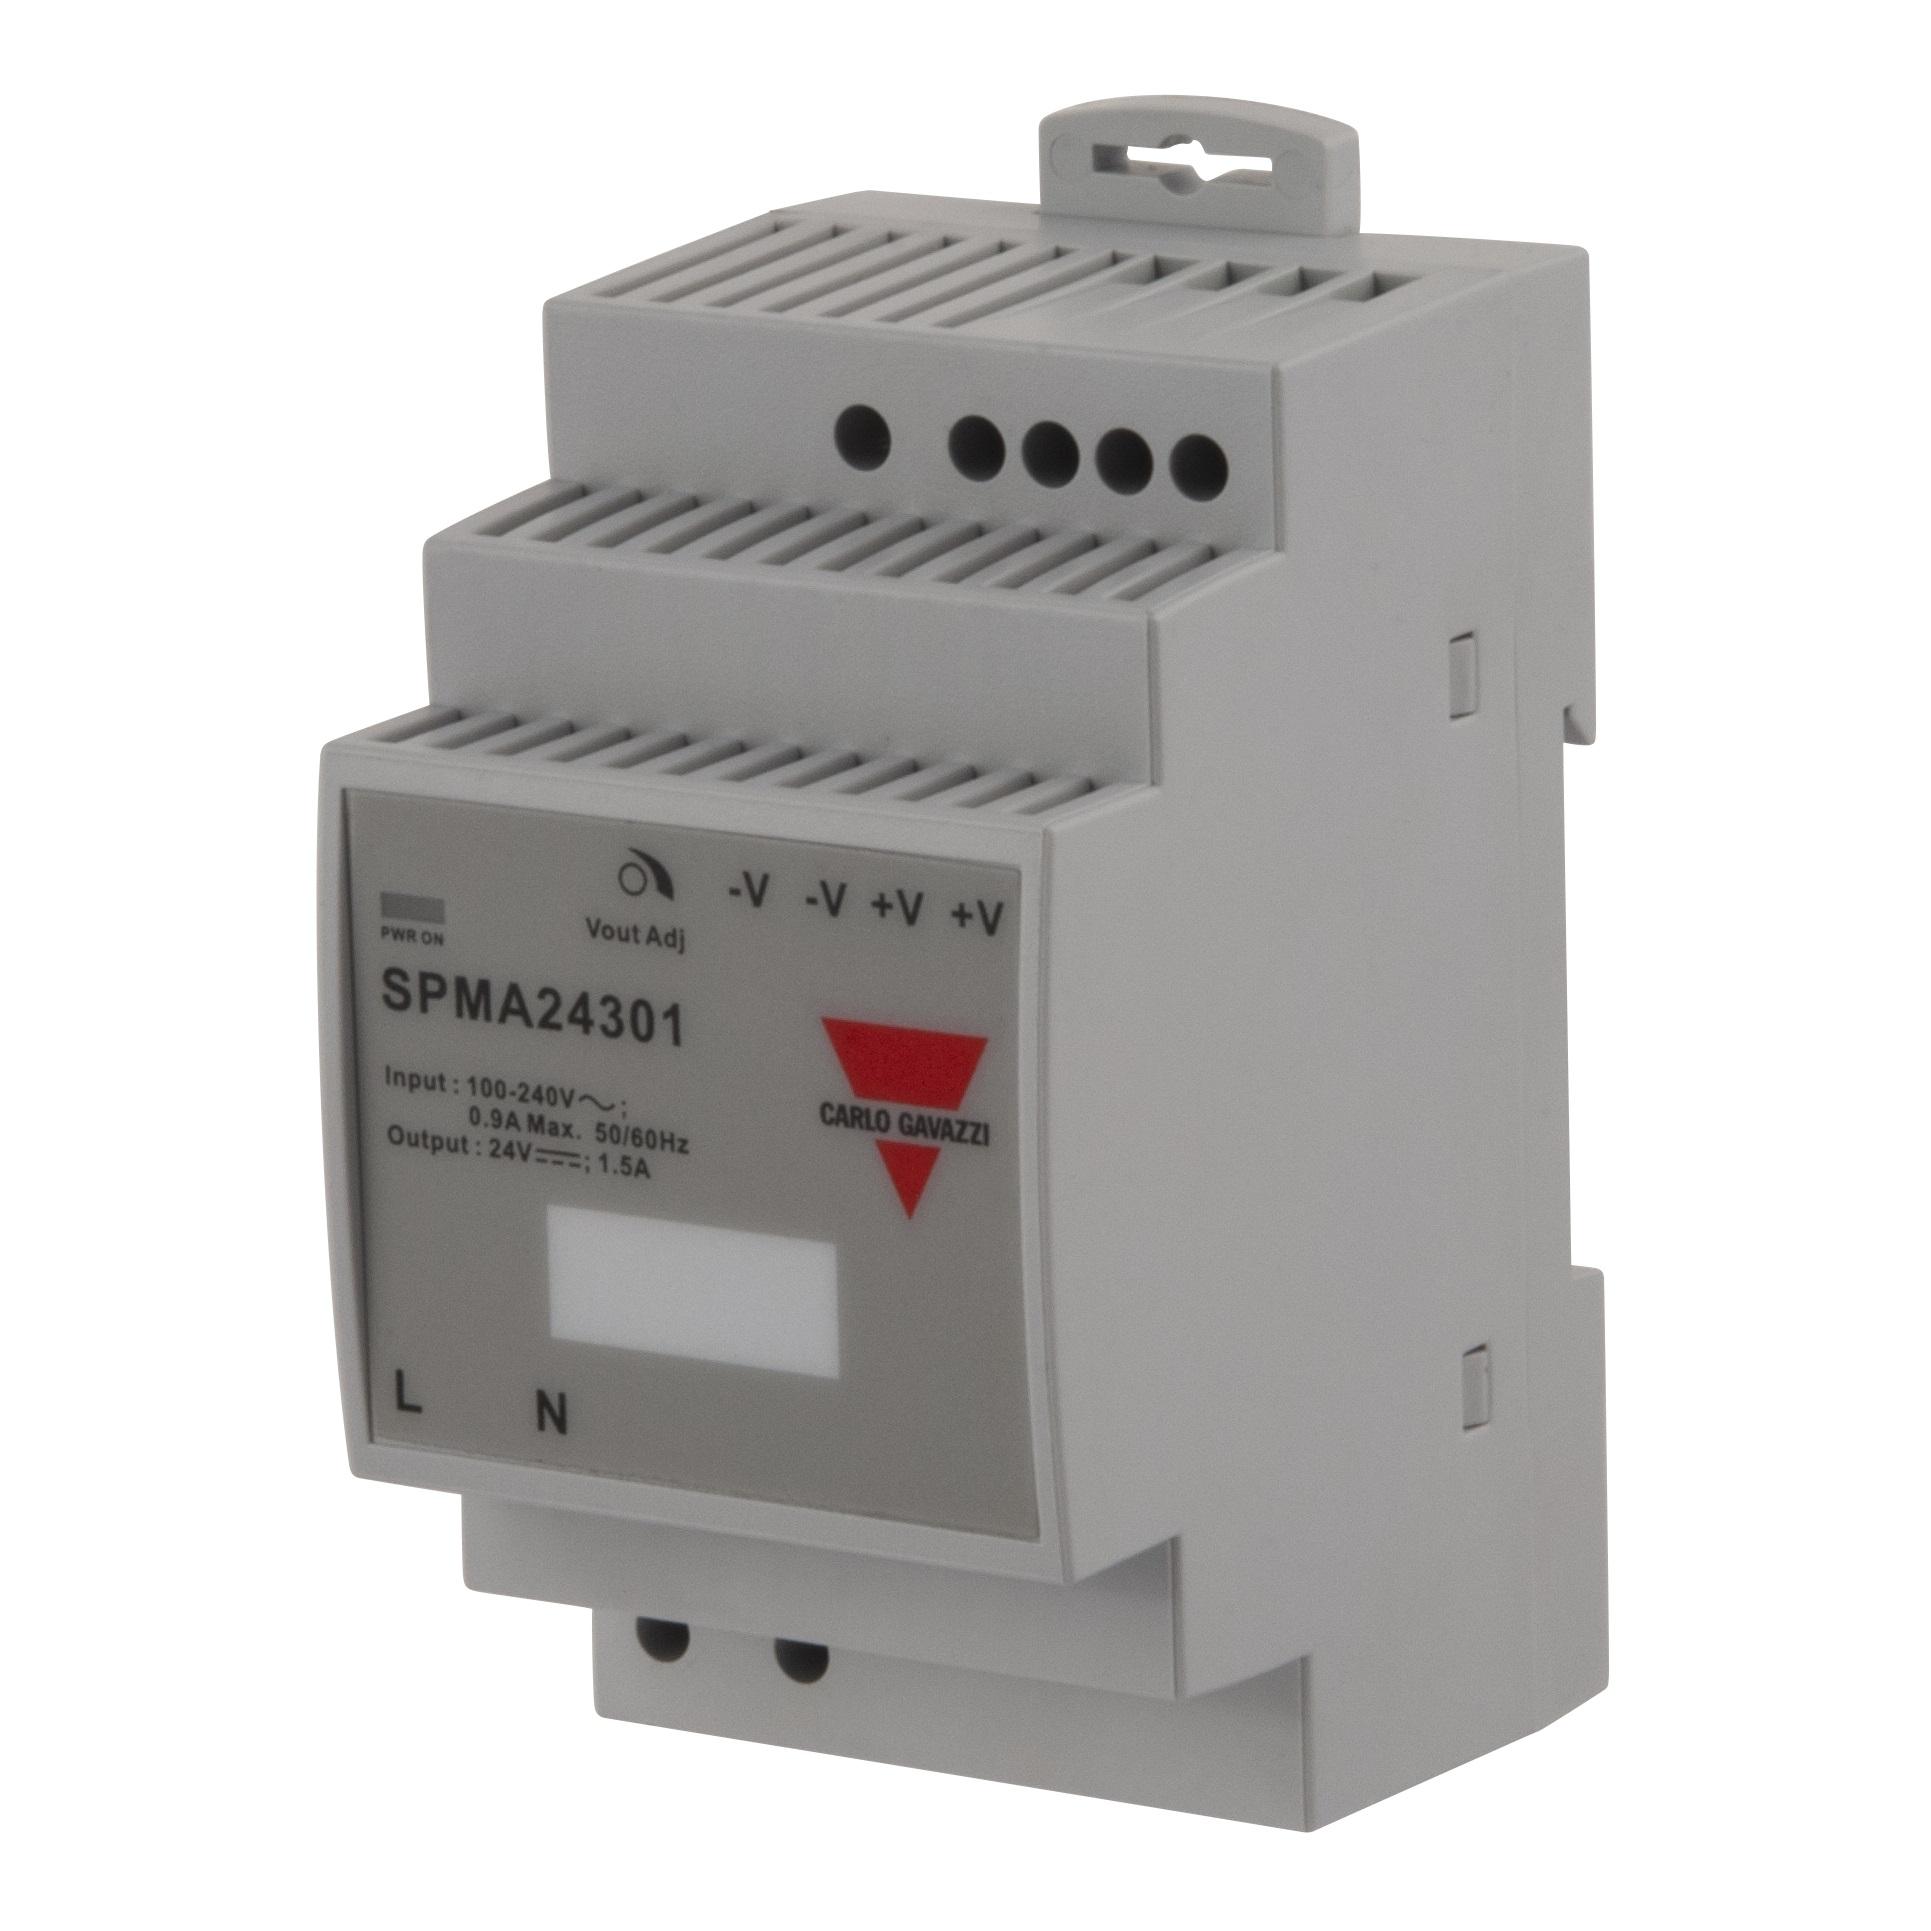 SPMA 30W 24VDC 1.5A